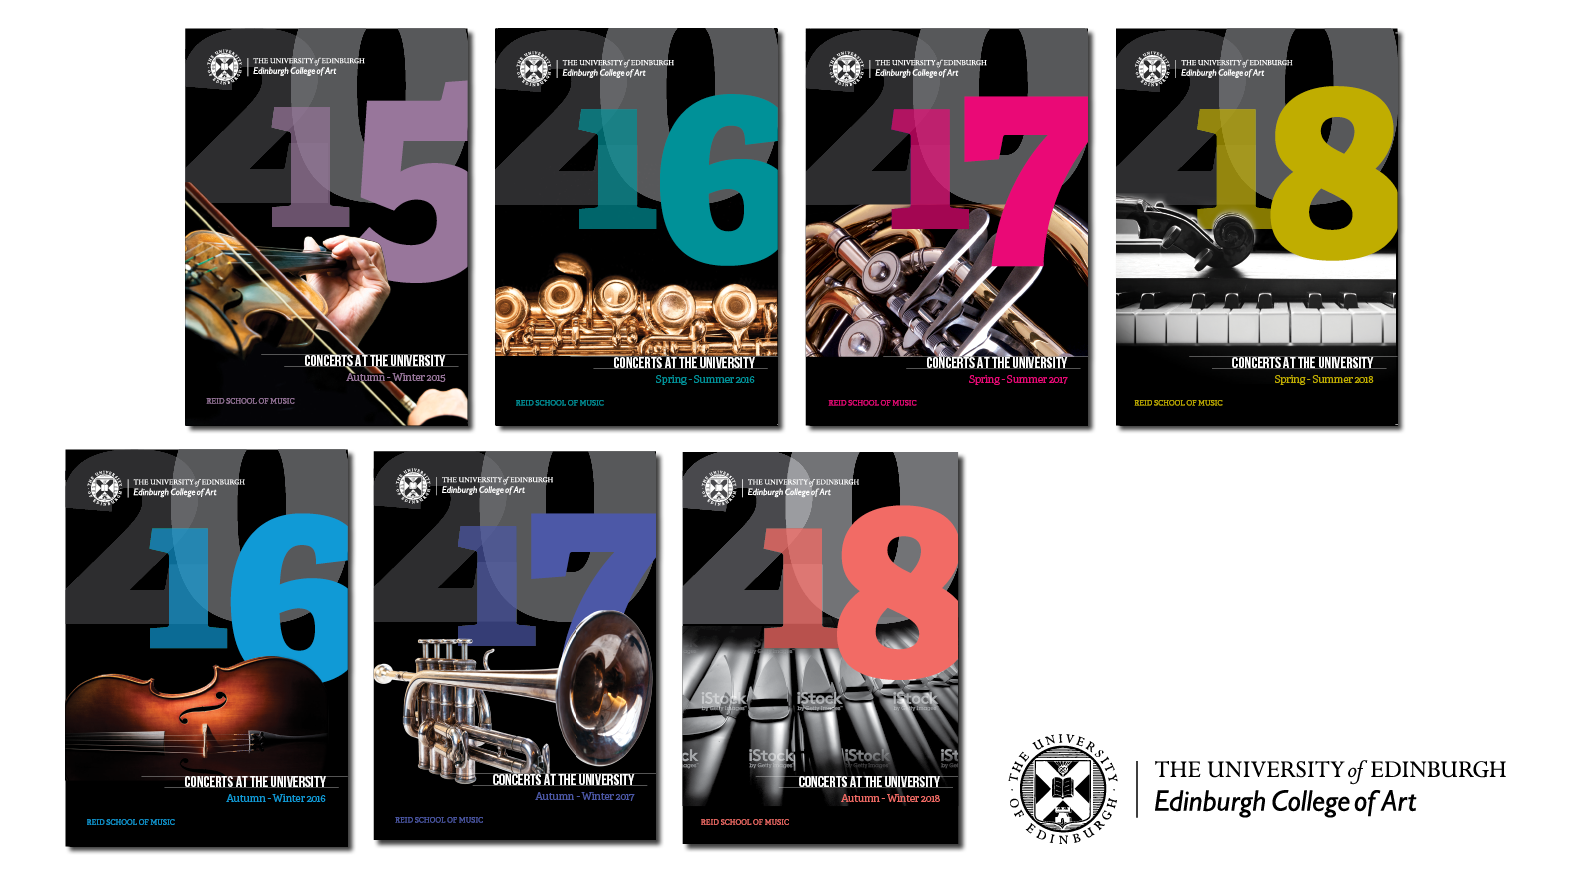 Edinburgh College of Art Concerts